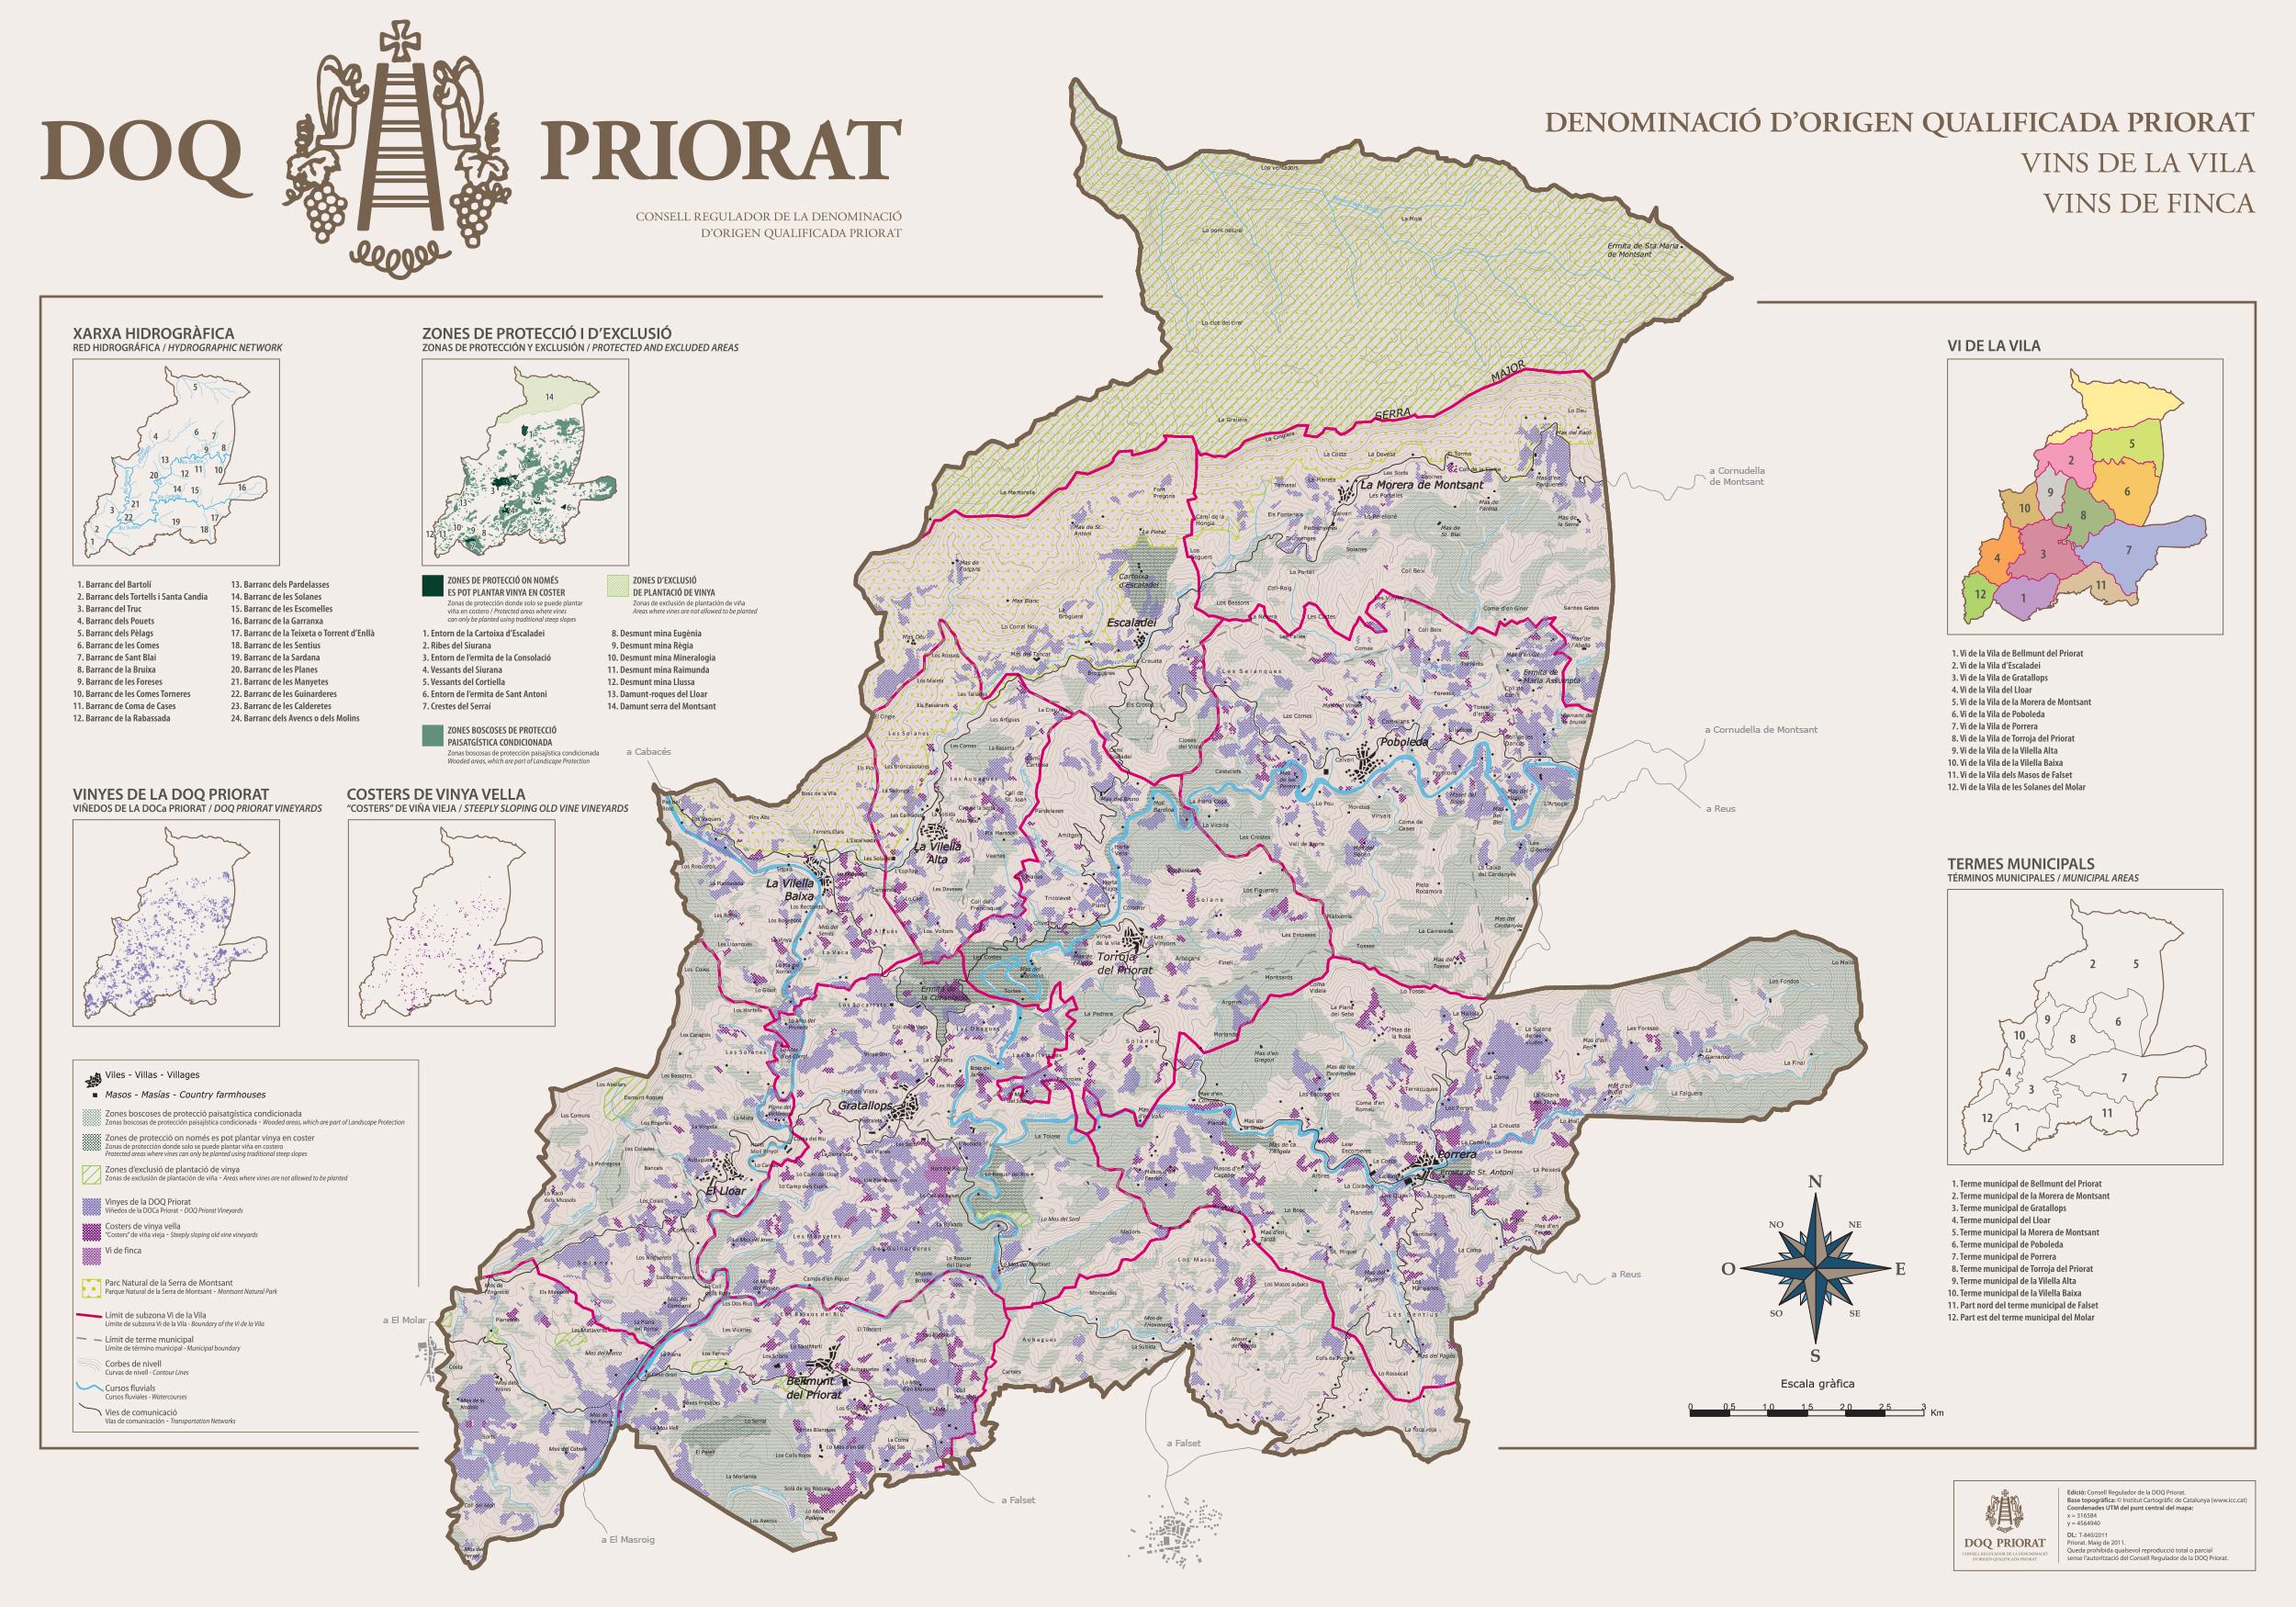 Map-DOQ-Priorat.jpg